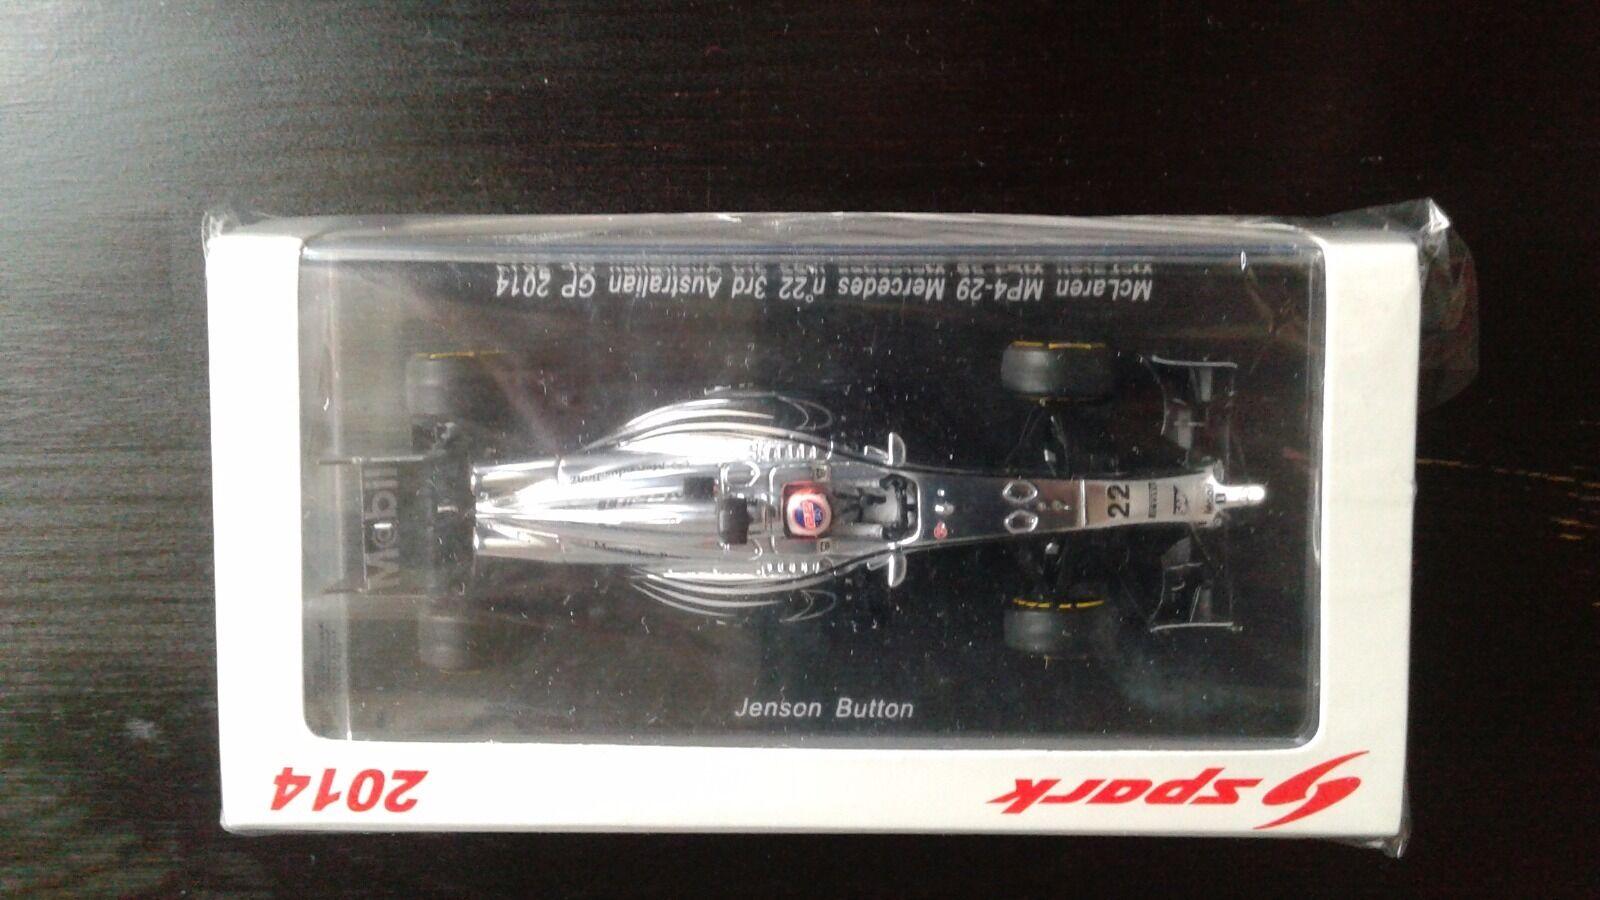 McLaren MP4-29 Mercedes n°22 3rd Australian GP 2014 Jenson Button 1 43